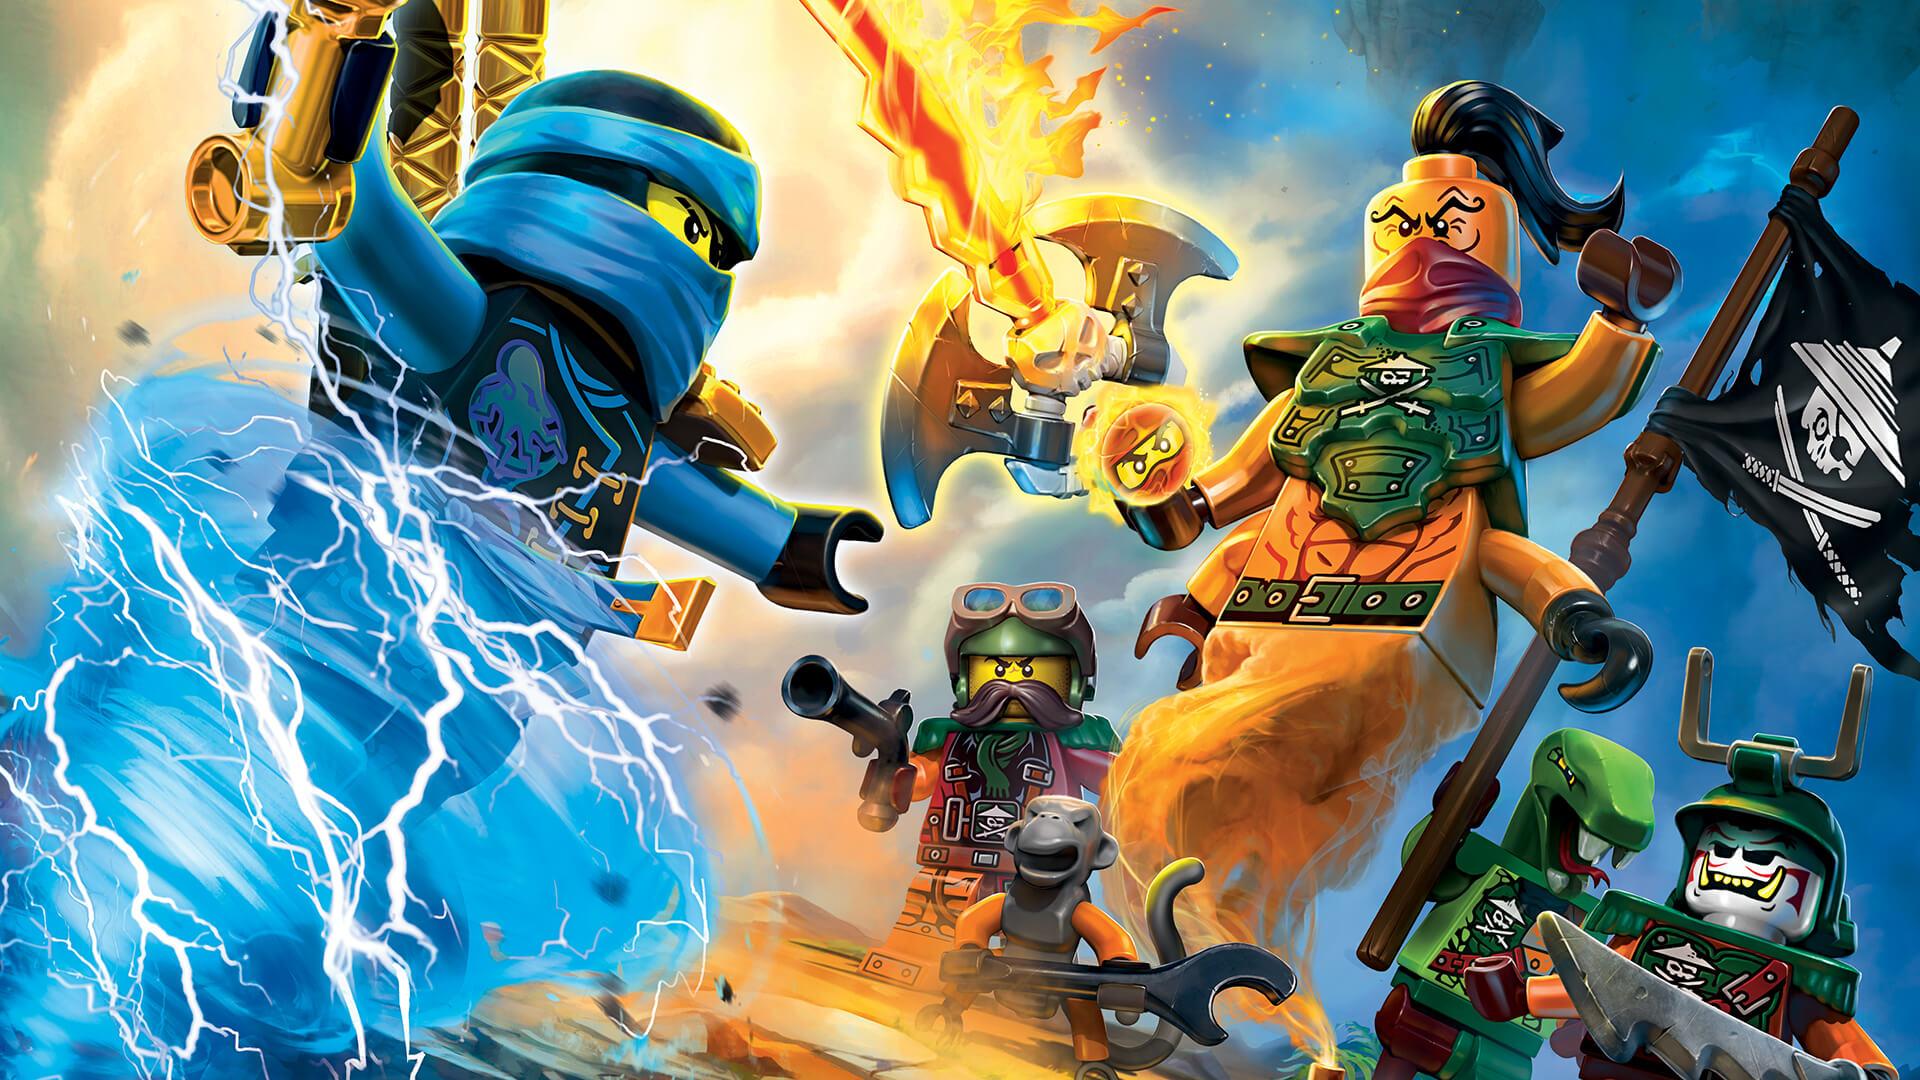 download wallpaper: LEGO Ninjago wallpaper